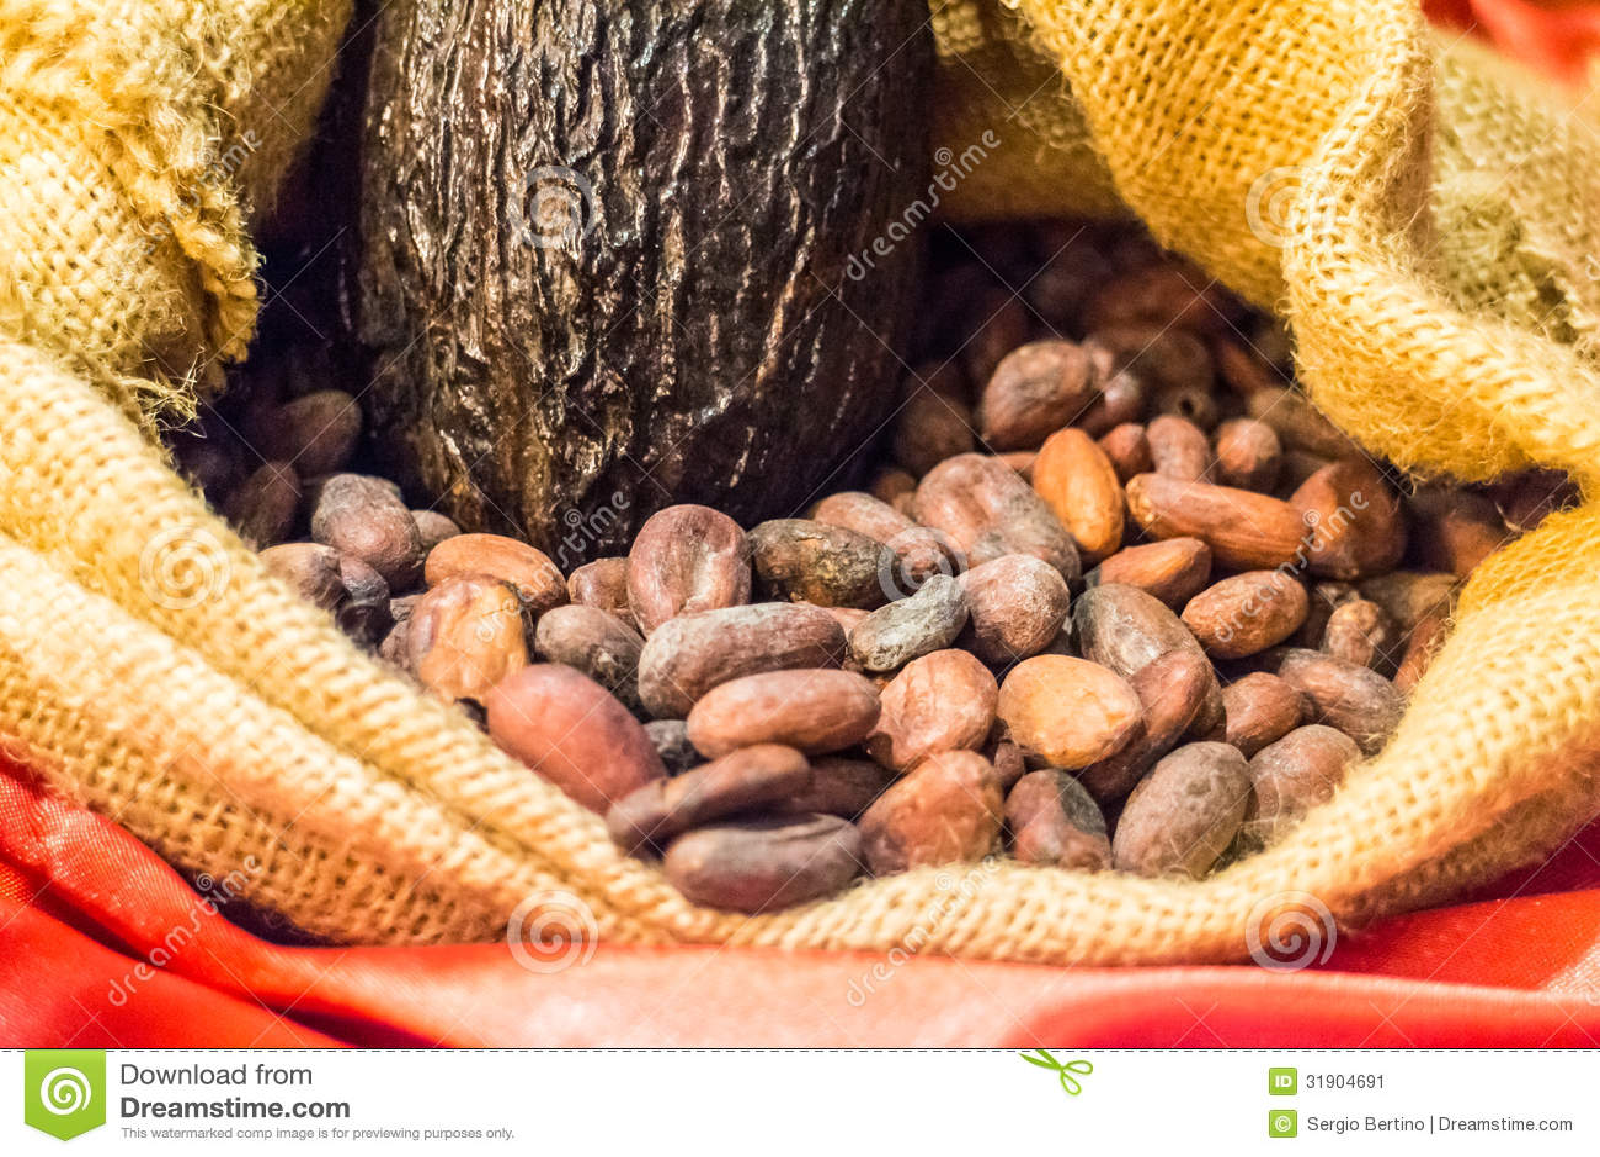 Graines Et Cosse De Cacao Crues En Toile De Jute Image Stock Image